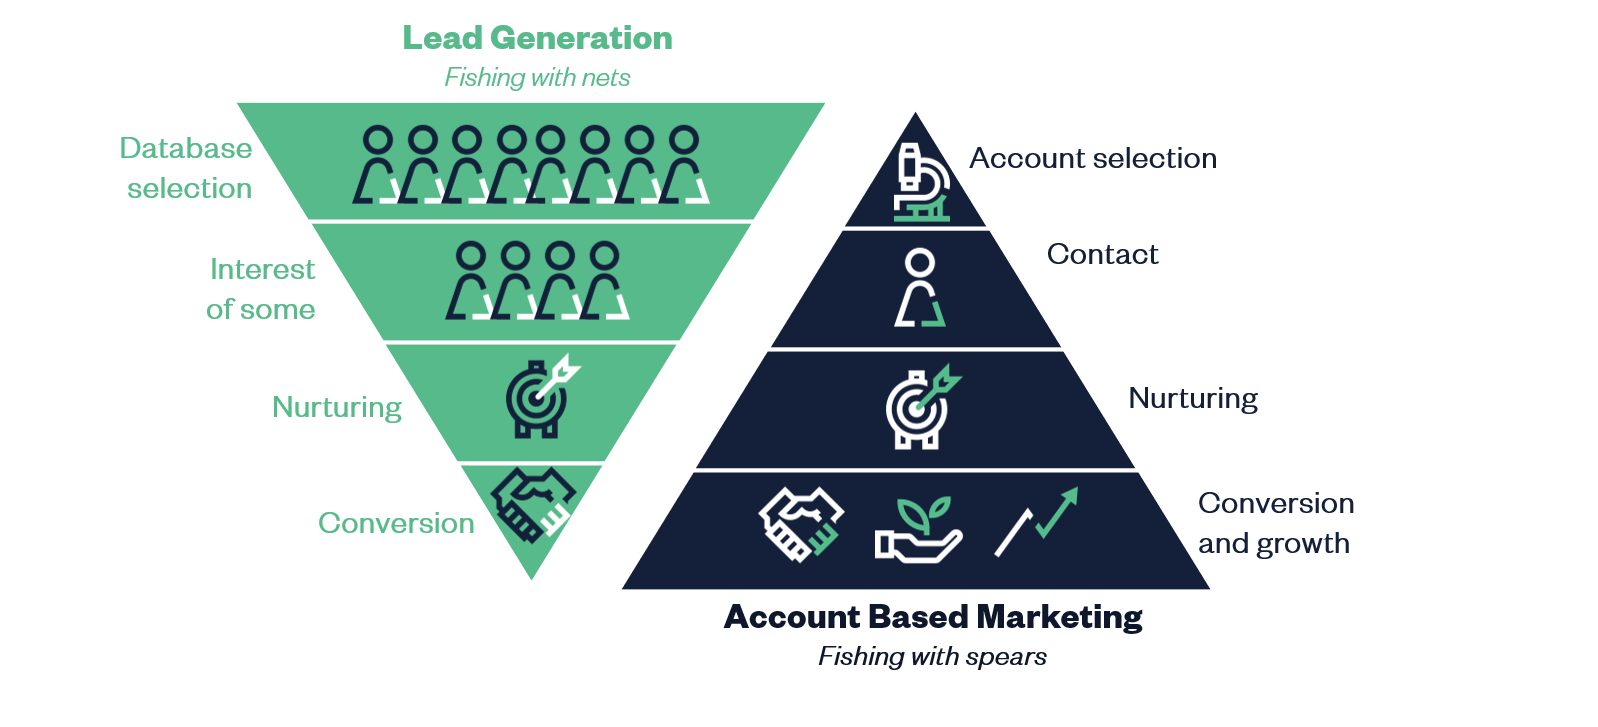 account based marketig vs. lead generation